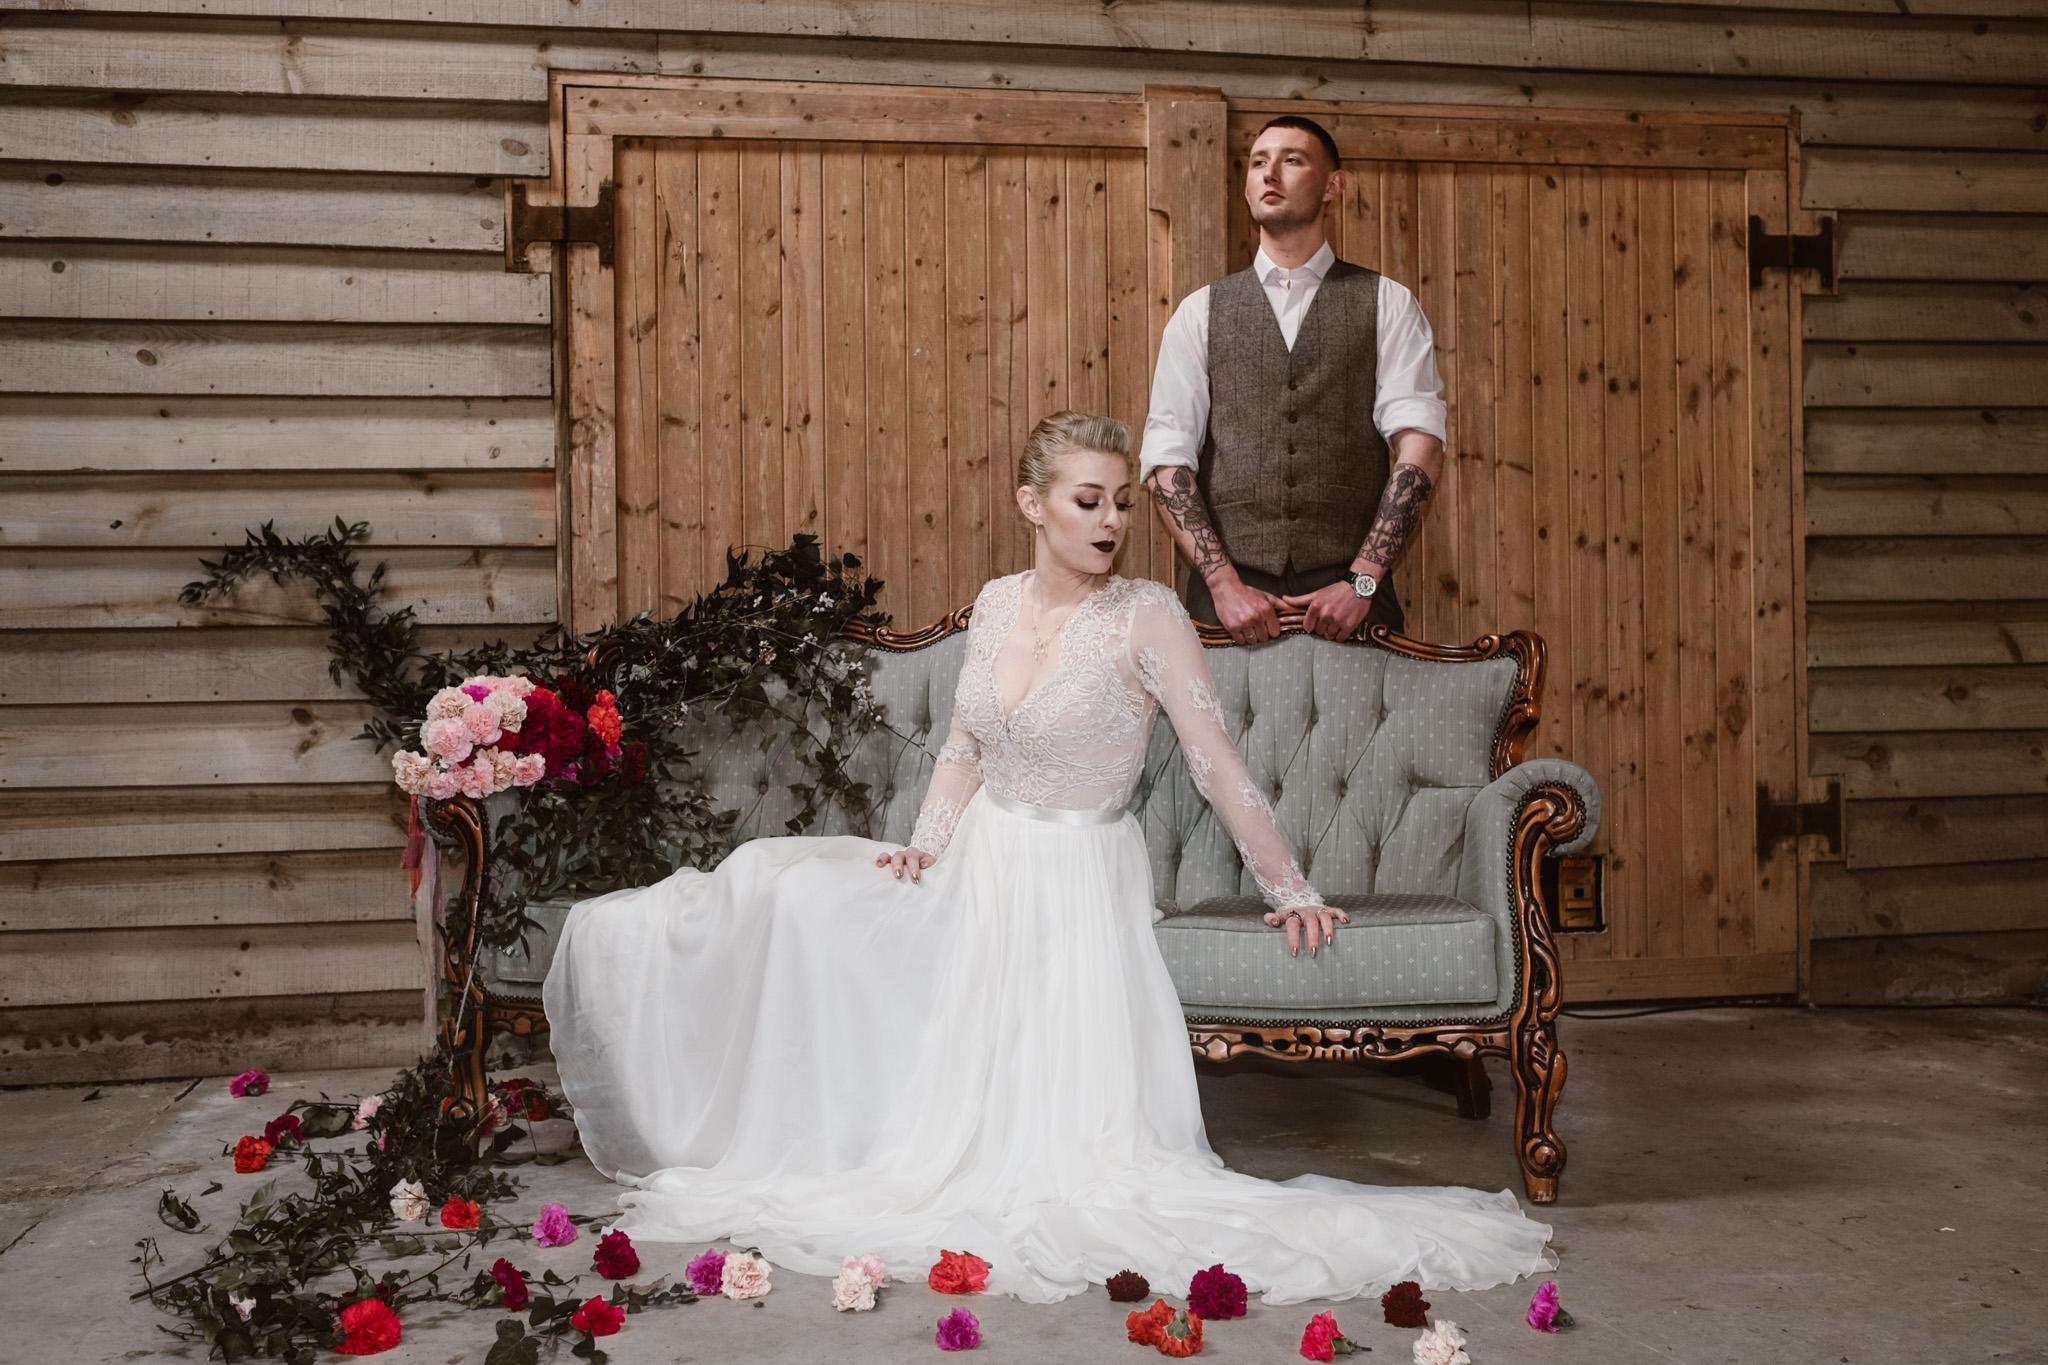 Captains-Wood-Barn-Alterative-Rustic-Vintage-Essex-Wedding-Suffolk-Grace-Elizabeth-59.jpg